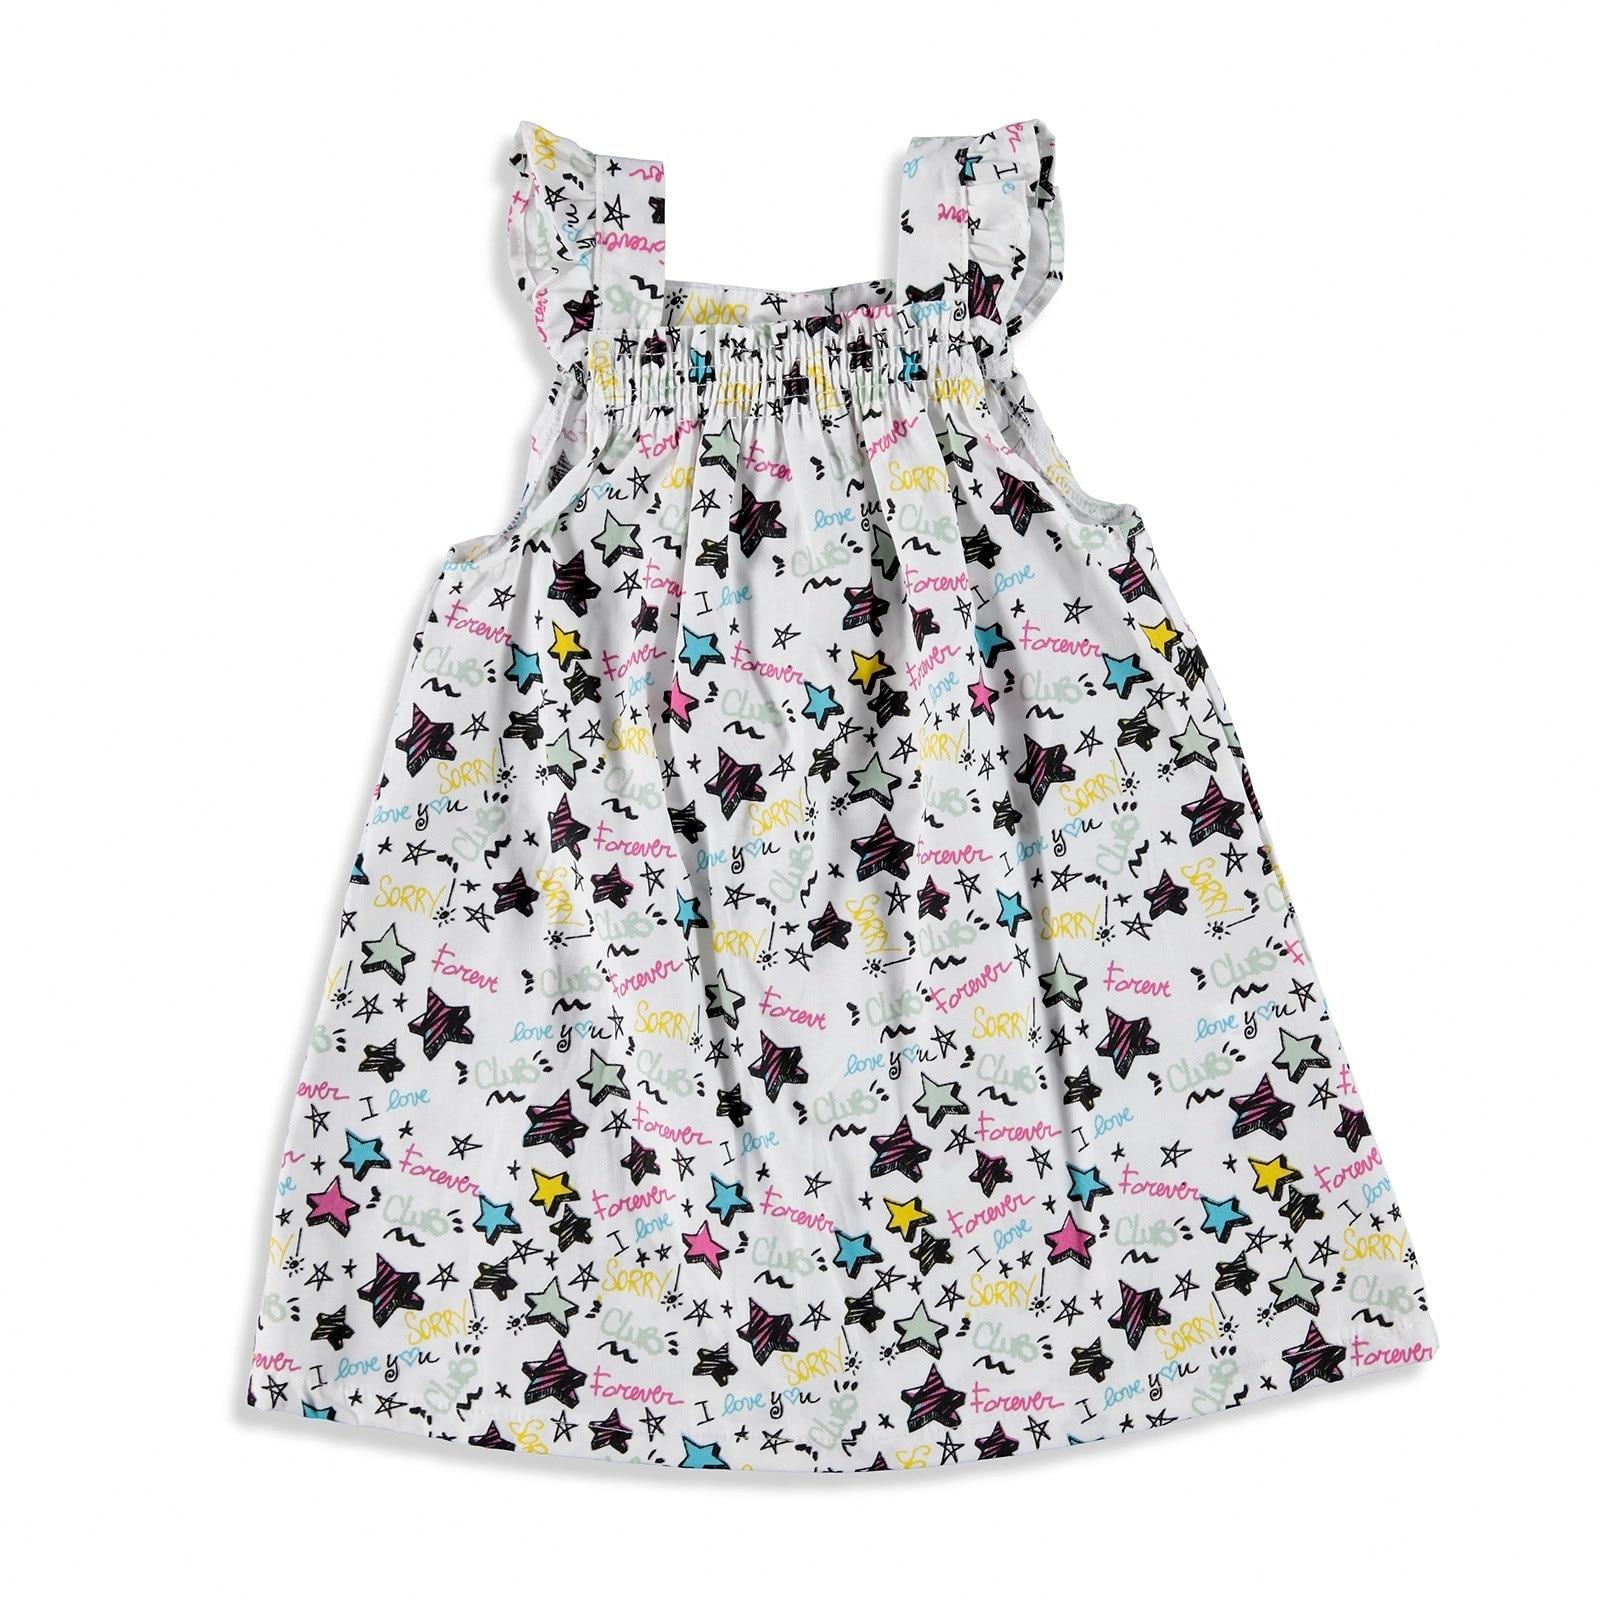 Ebebek HelloBaby Ruffled Shoulder Detailed Texture Baby Girl Dress